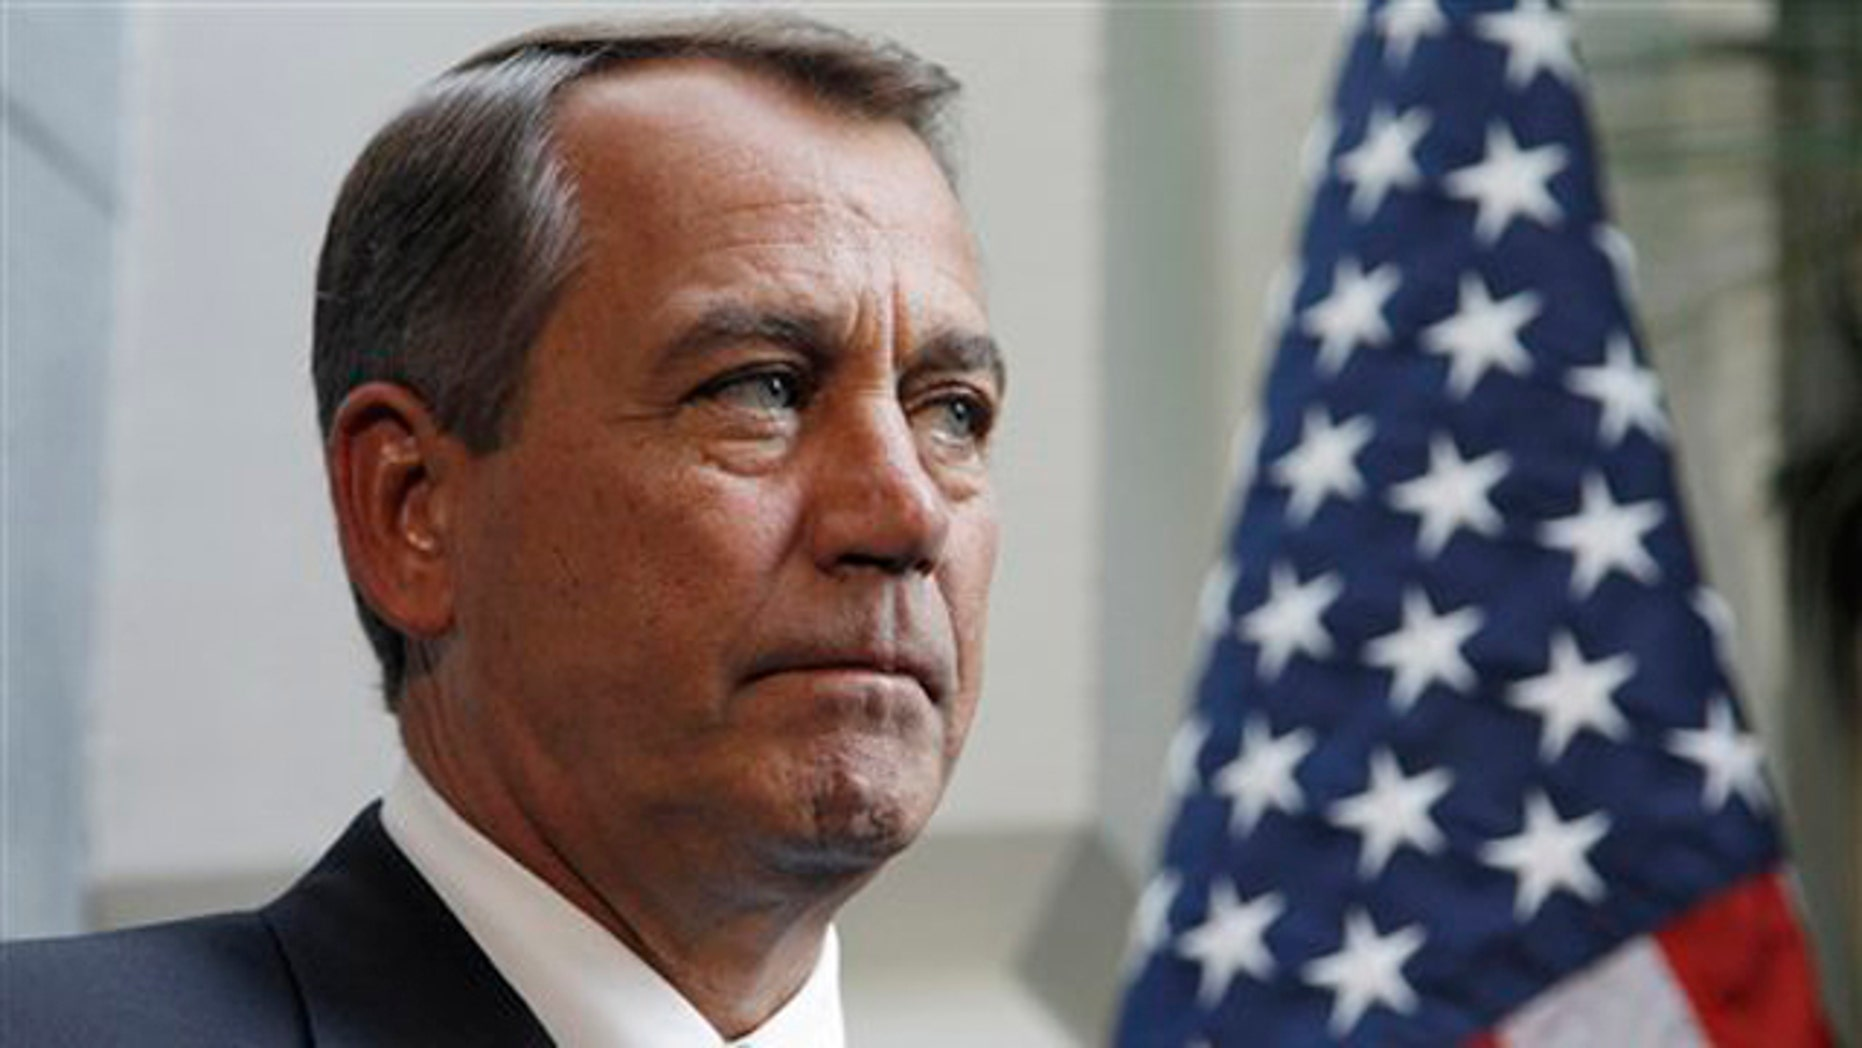 House Speaker John Boehner waits to speak Feb. 9 before his lunch meeting with President Obama in Washington.